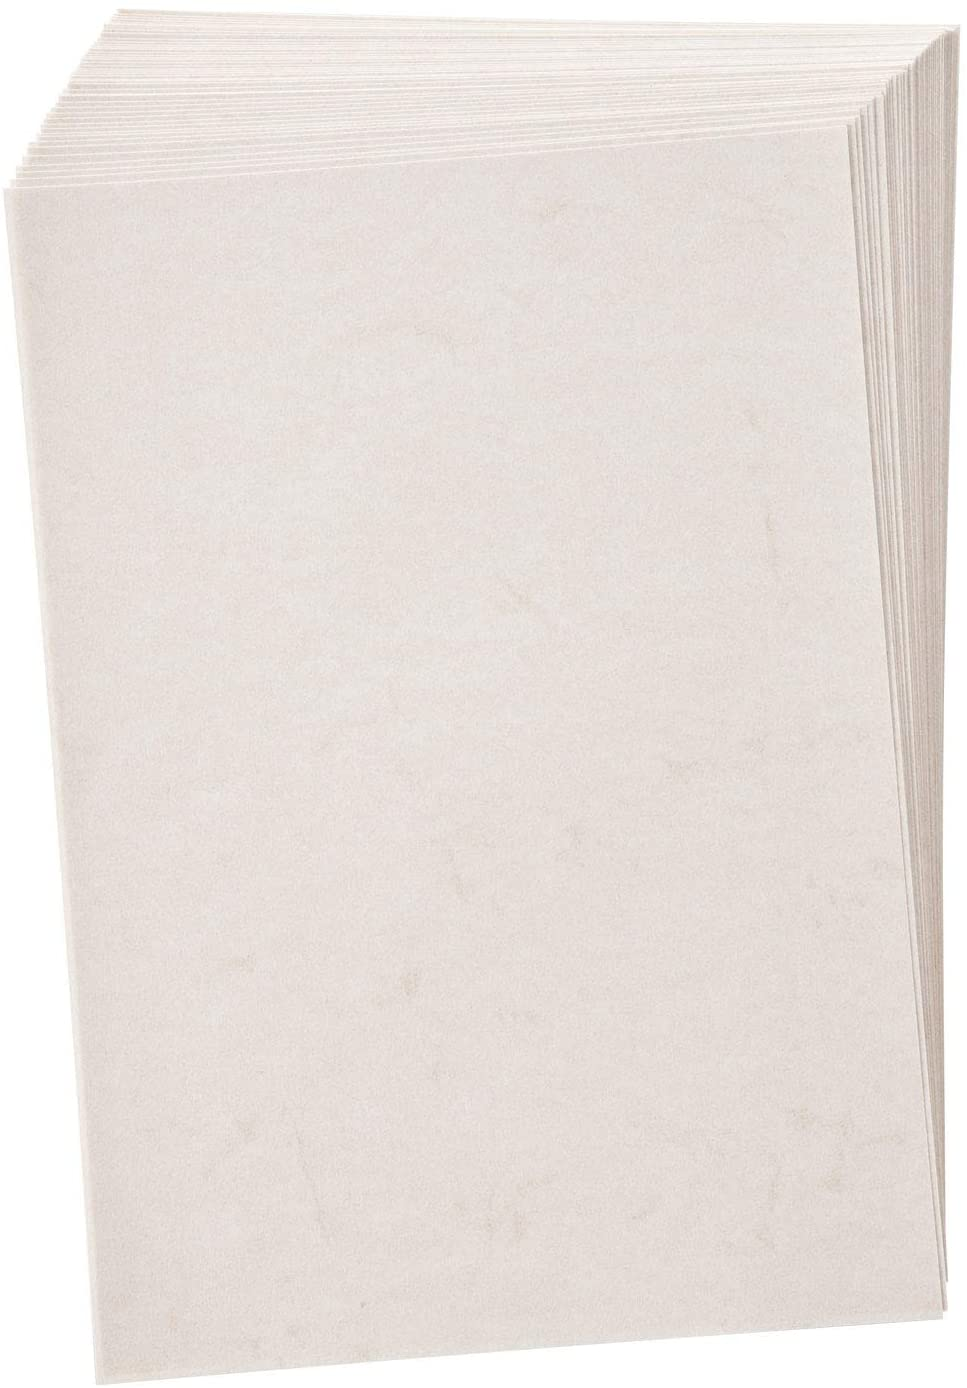 folia 950400 - Elefantenhaut, Urkundenpapier, 50 Blatt, 110 g/qm, DIN A4, weiß - elegantes Papier fü